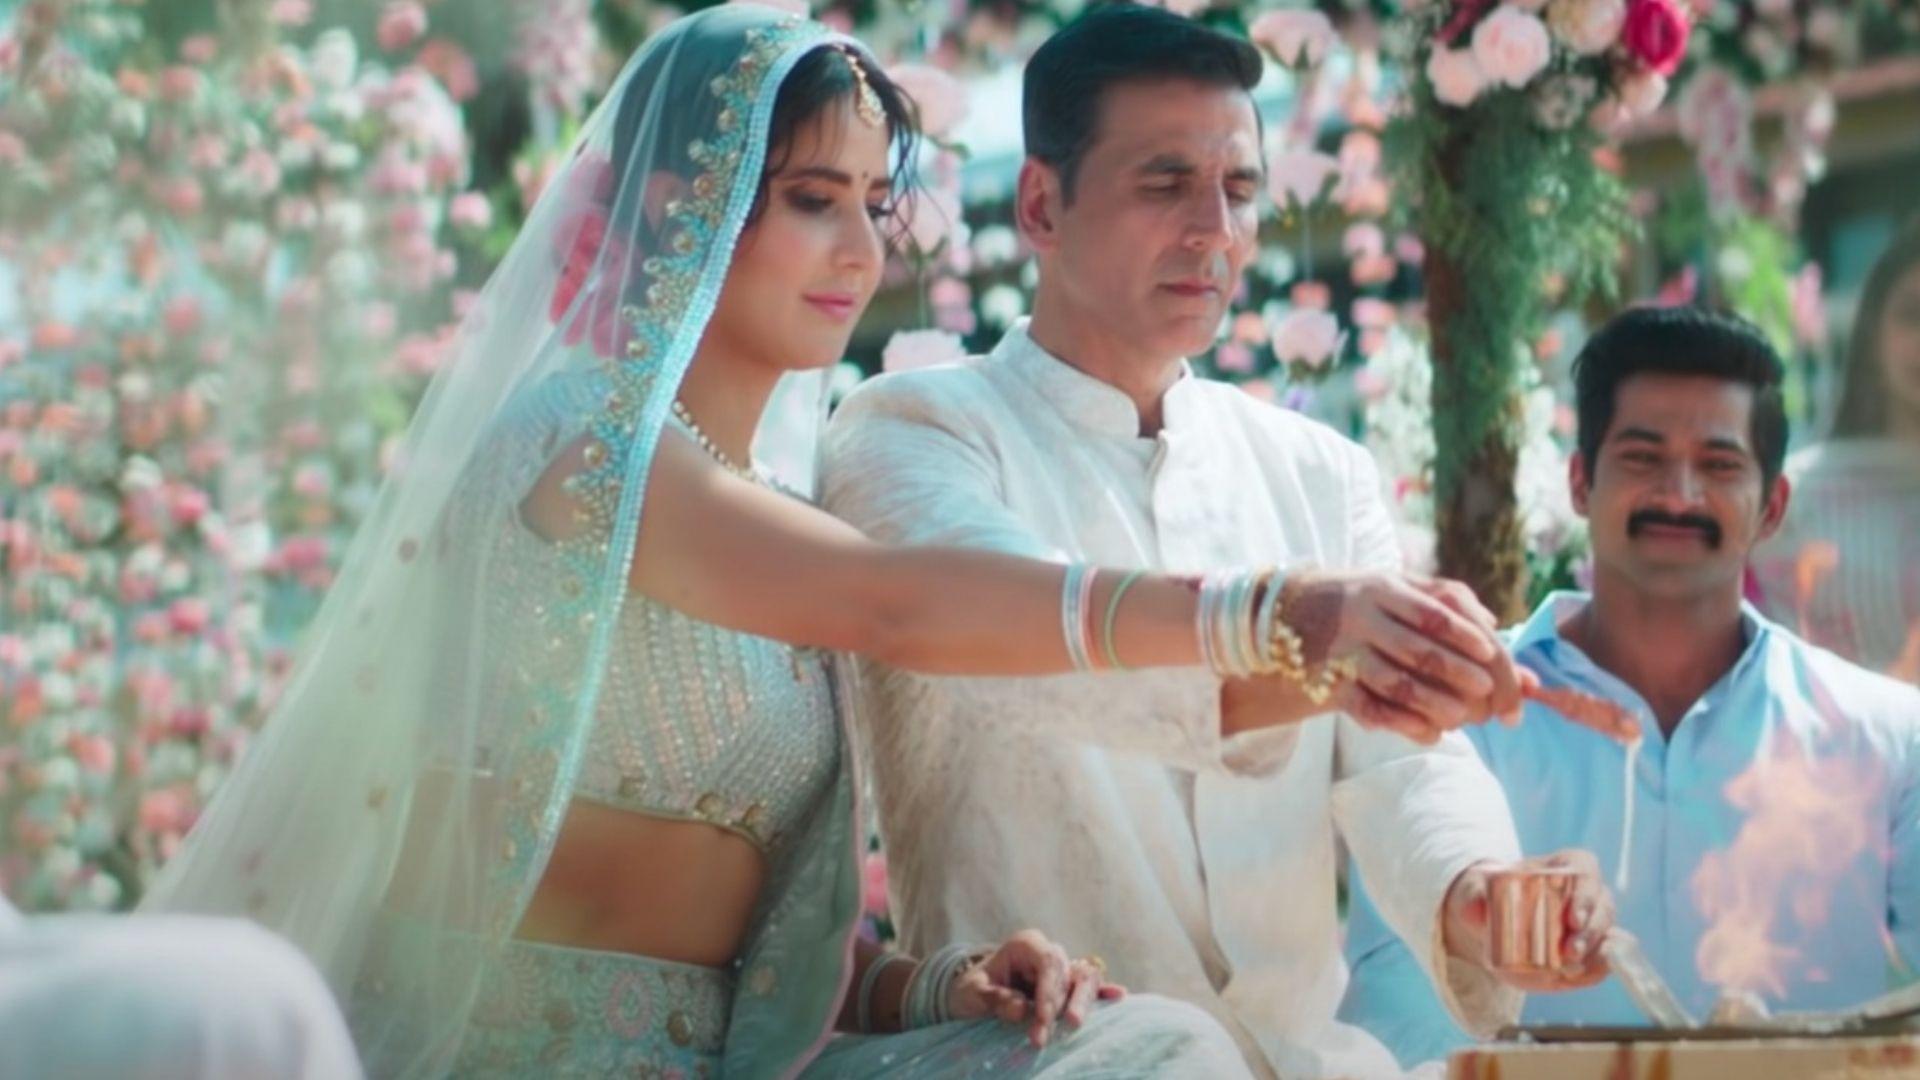 Sooryavanshi Song Mere Yaaraa Out: Akshay Kumar And Katrina Kaif Weave Magic, Romance And Love In Arijit Singh's Melody